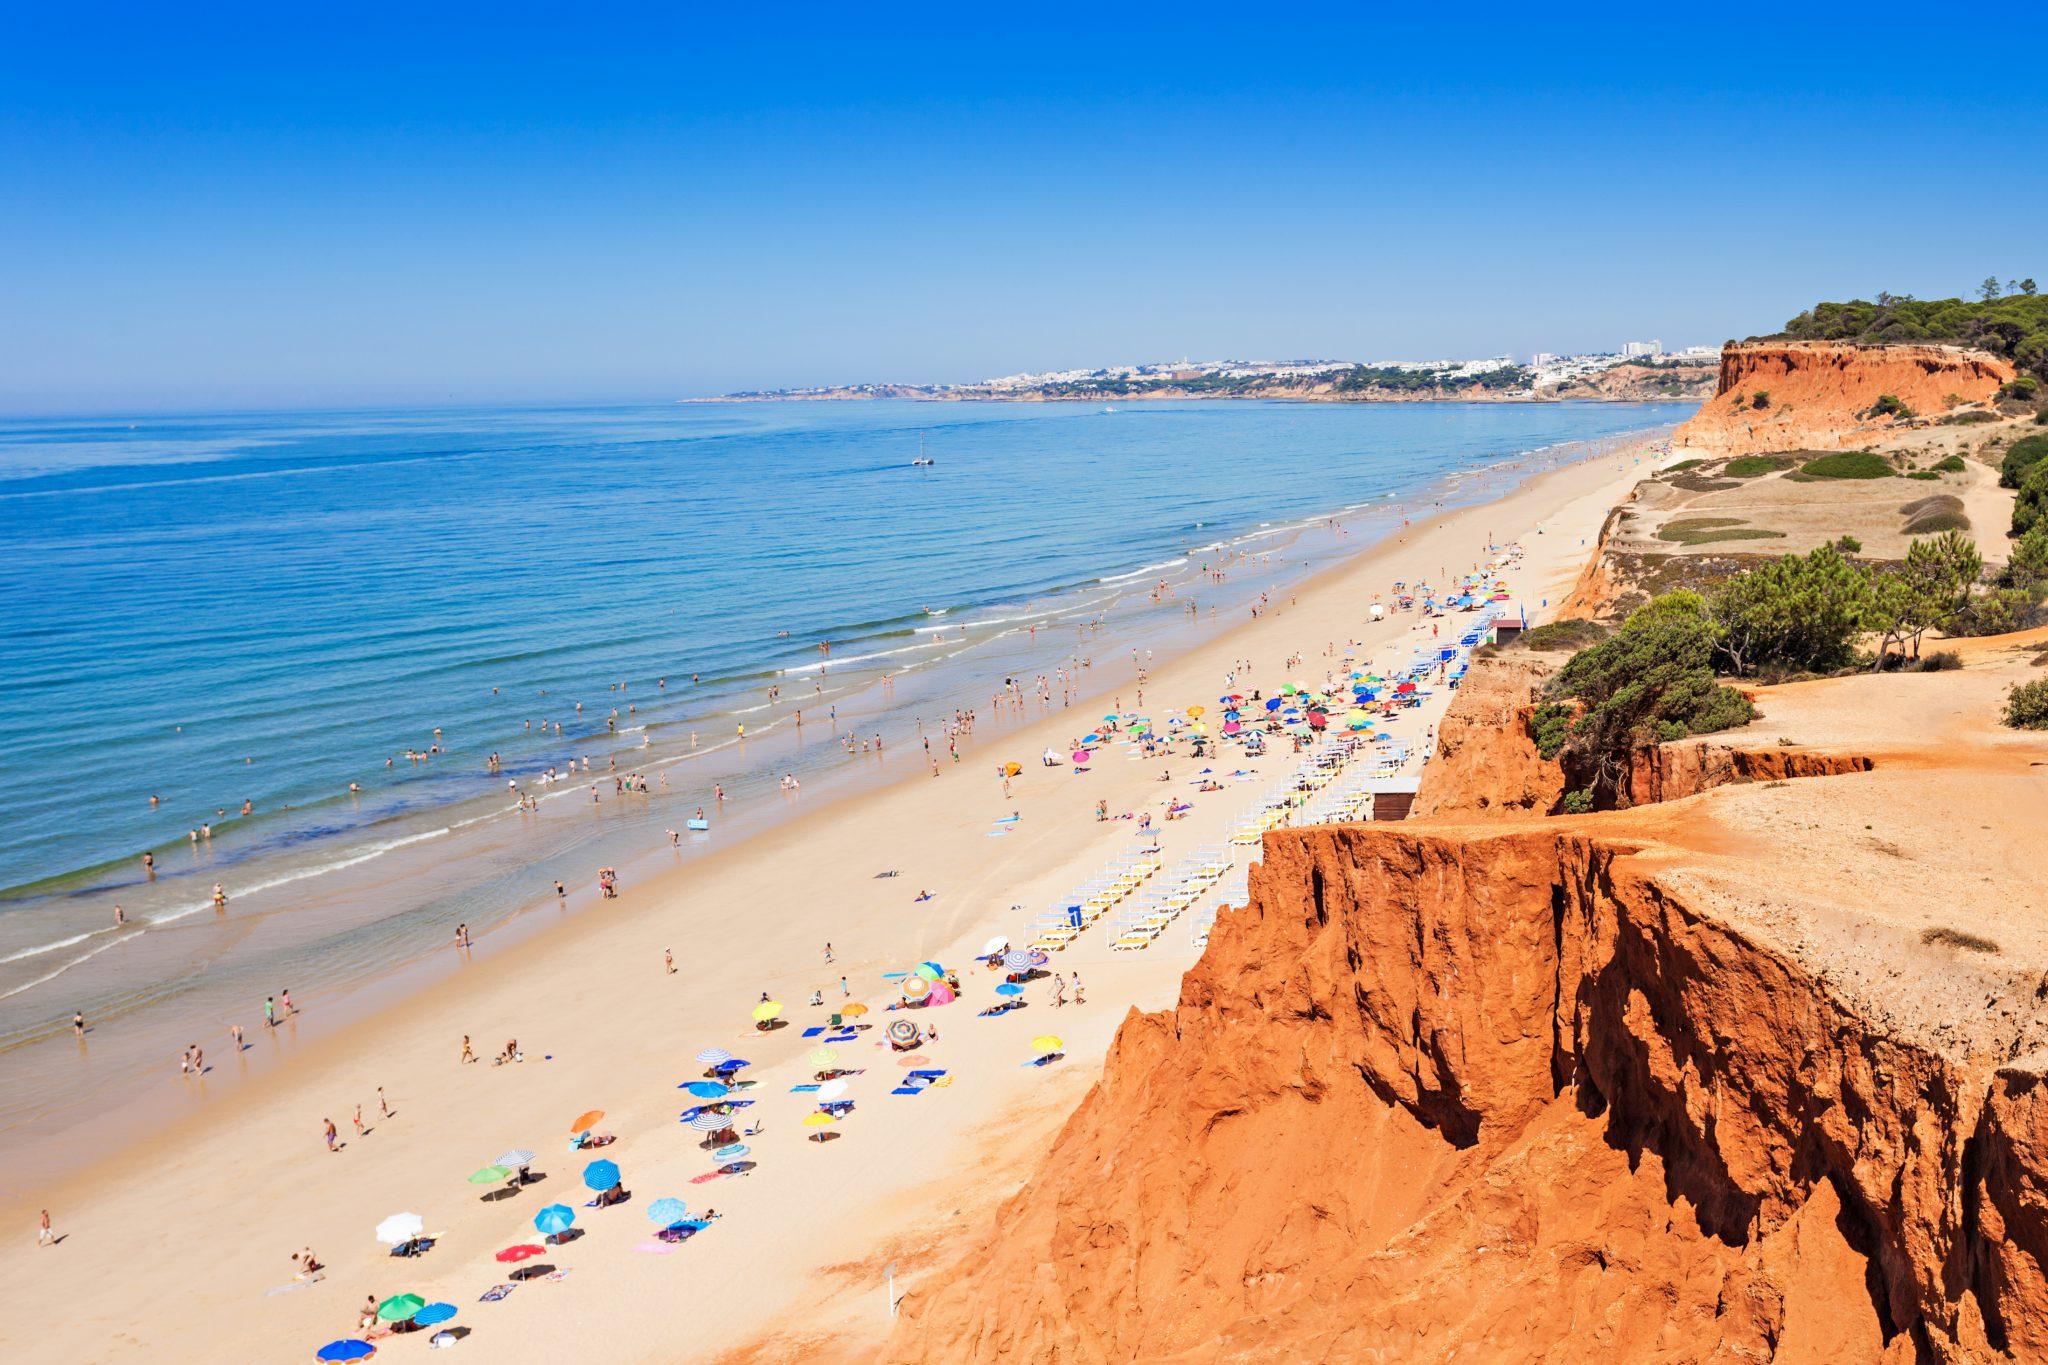 5 miles of beach sand